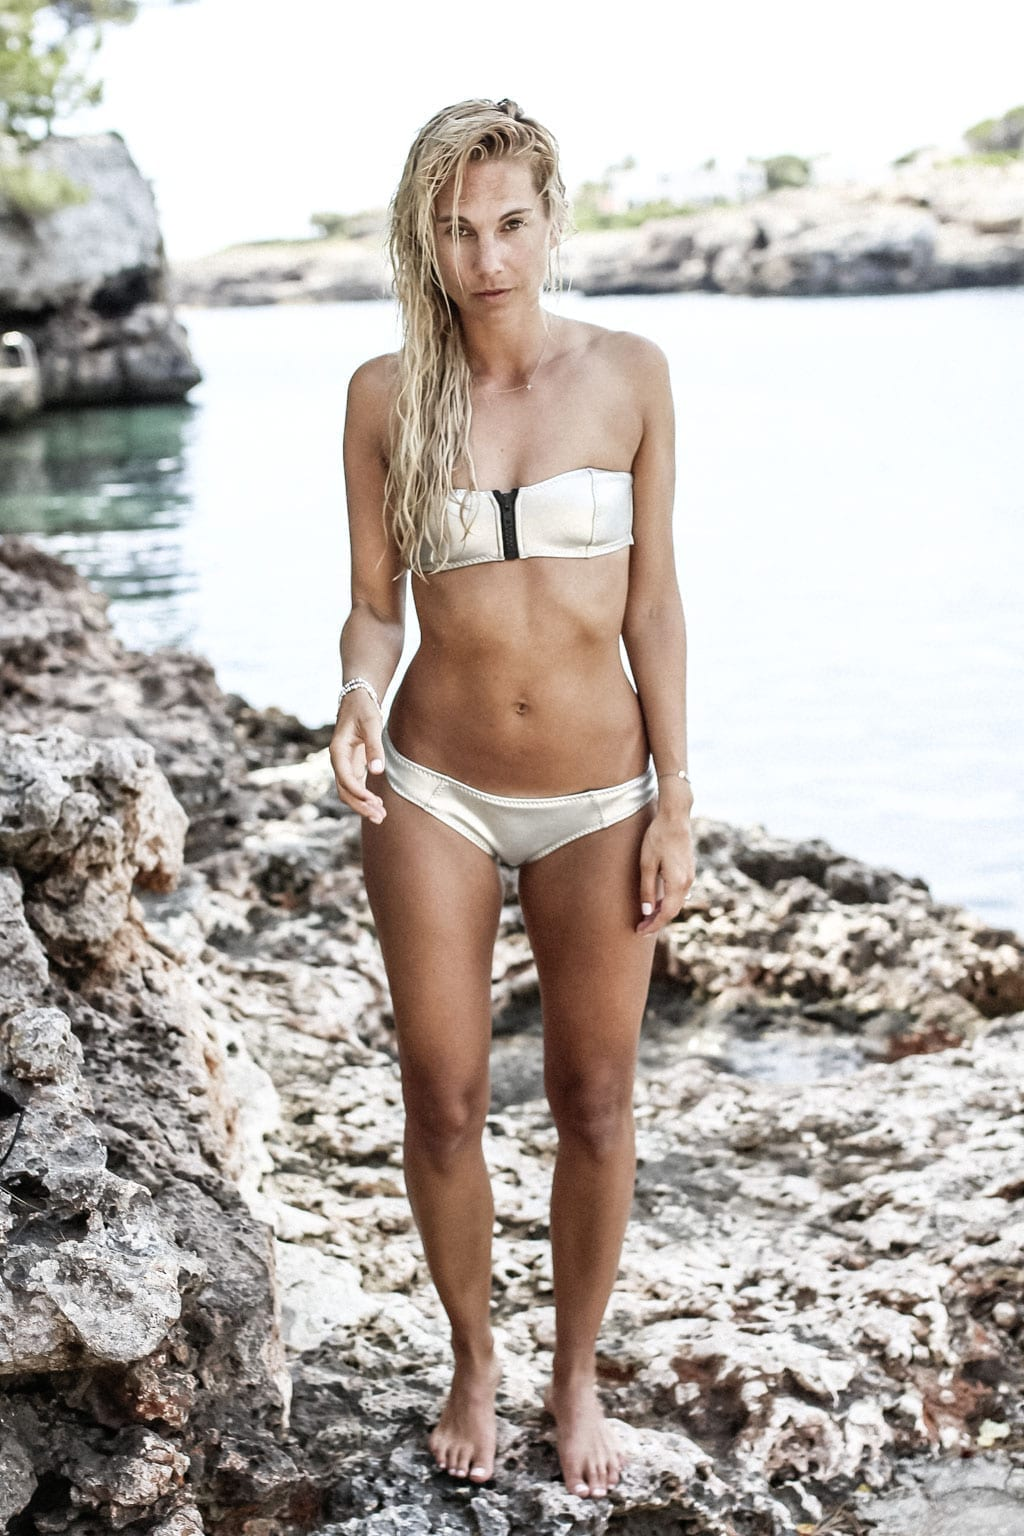 CK-1606_Sardinien-Sardegna-Sardinia-Italy-Italia-Fashion-Blog-Beach-Caribbean-Dress-Blonde-Karin-Kaswurm-Bikini-Kiini-0943